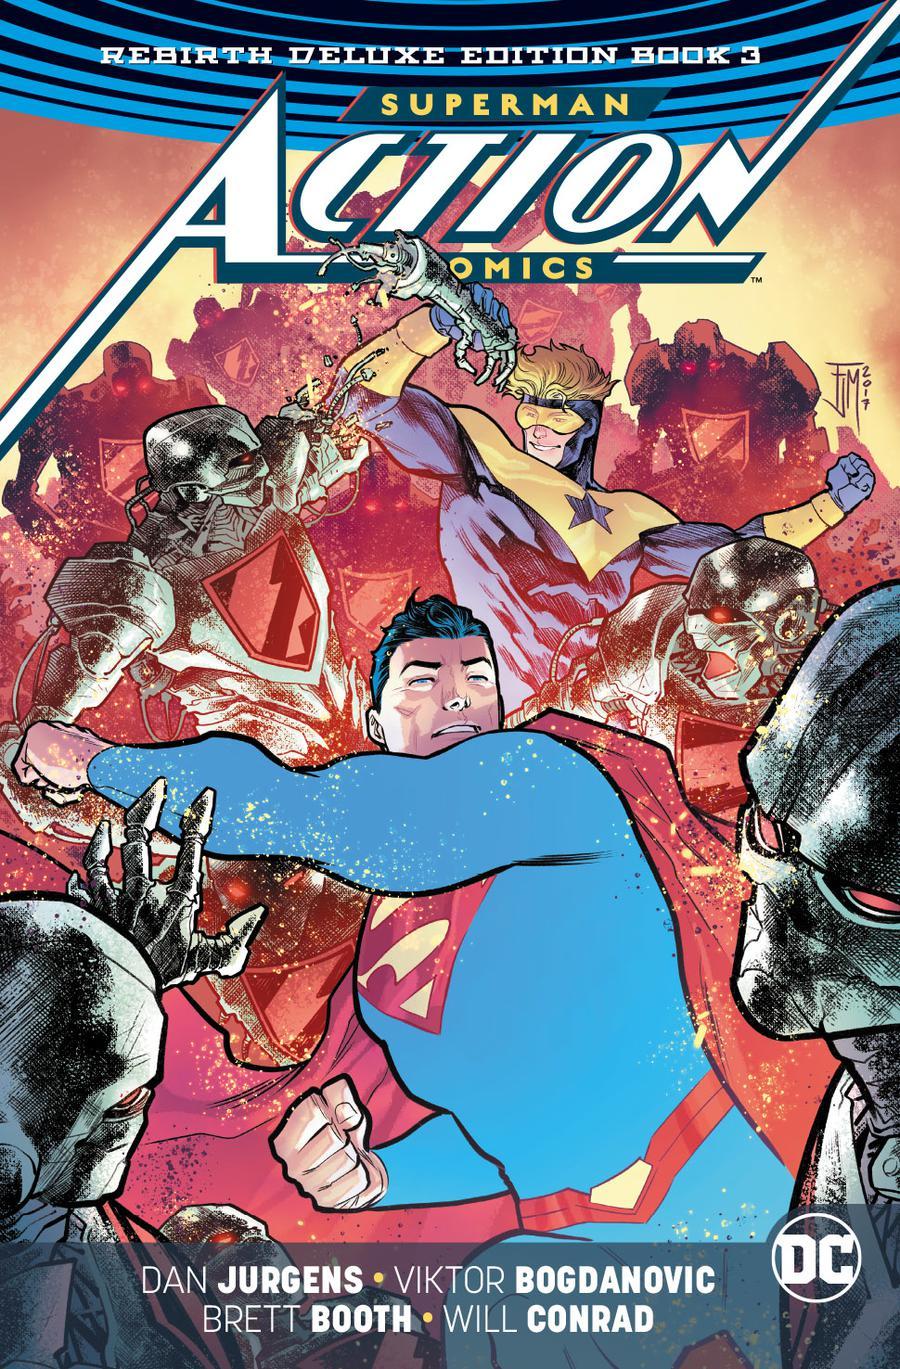 Superman Action Comics Rebirth Deluxe Edition Book 3 HC